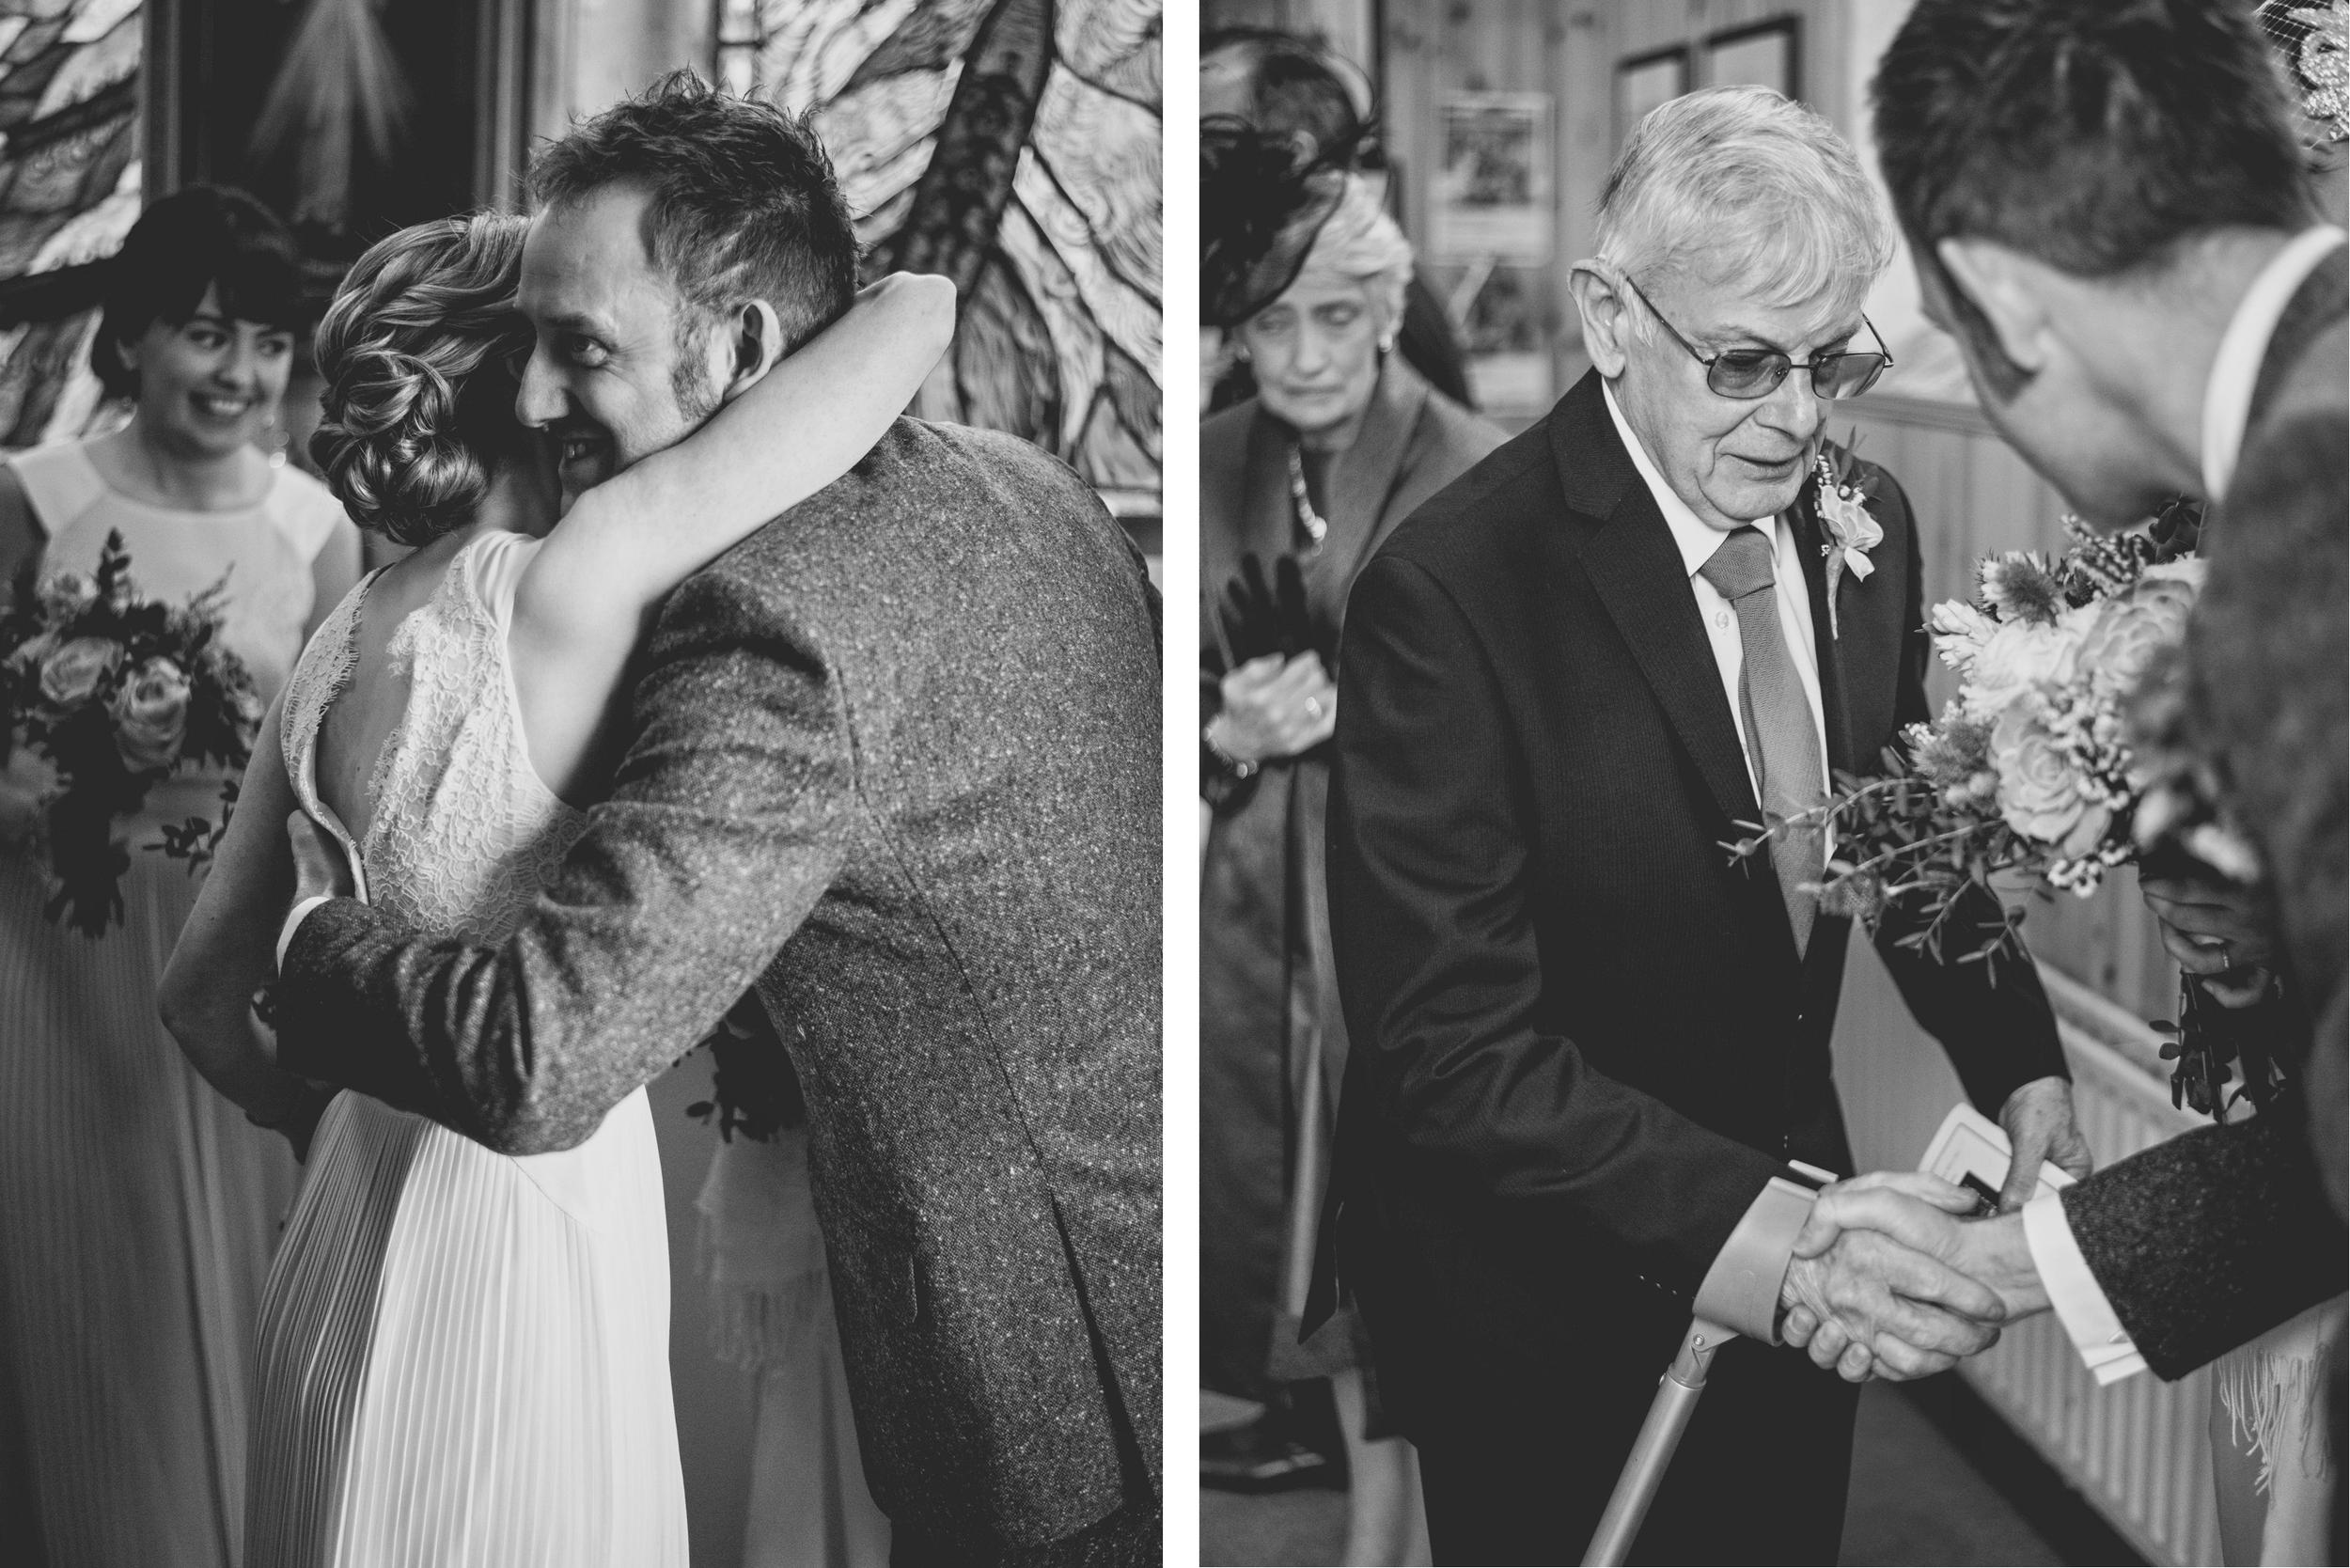 Guests congratulate wedding couple